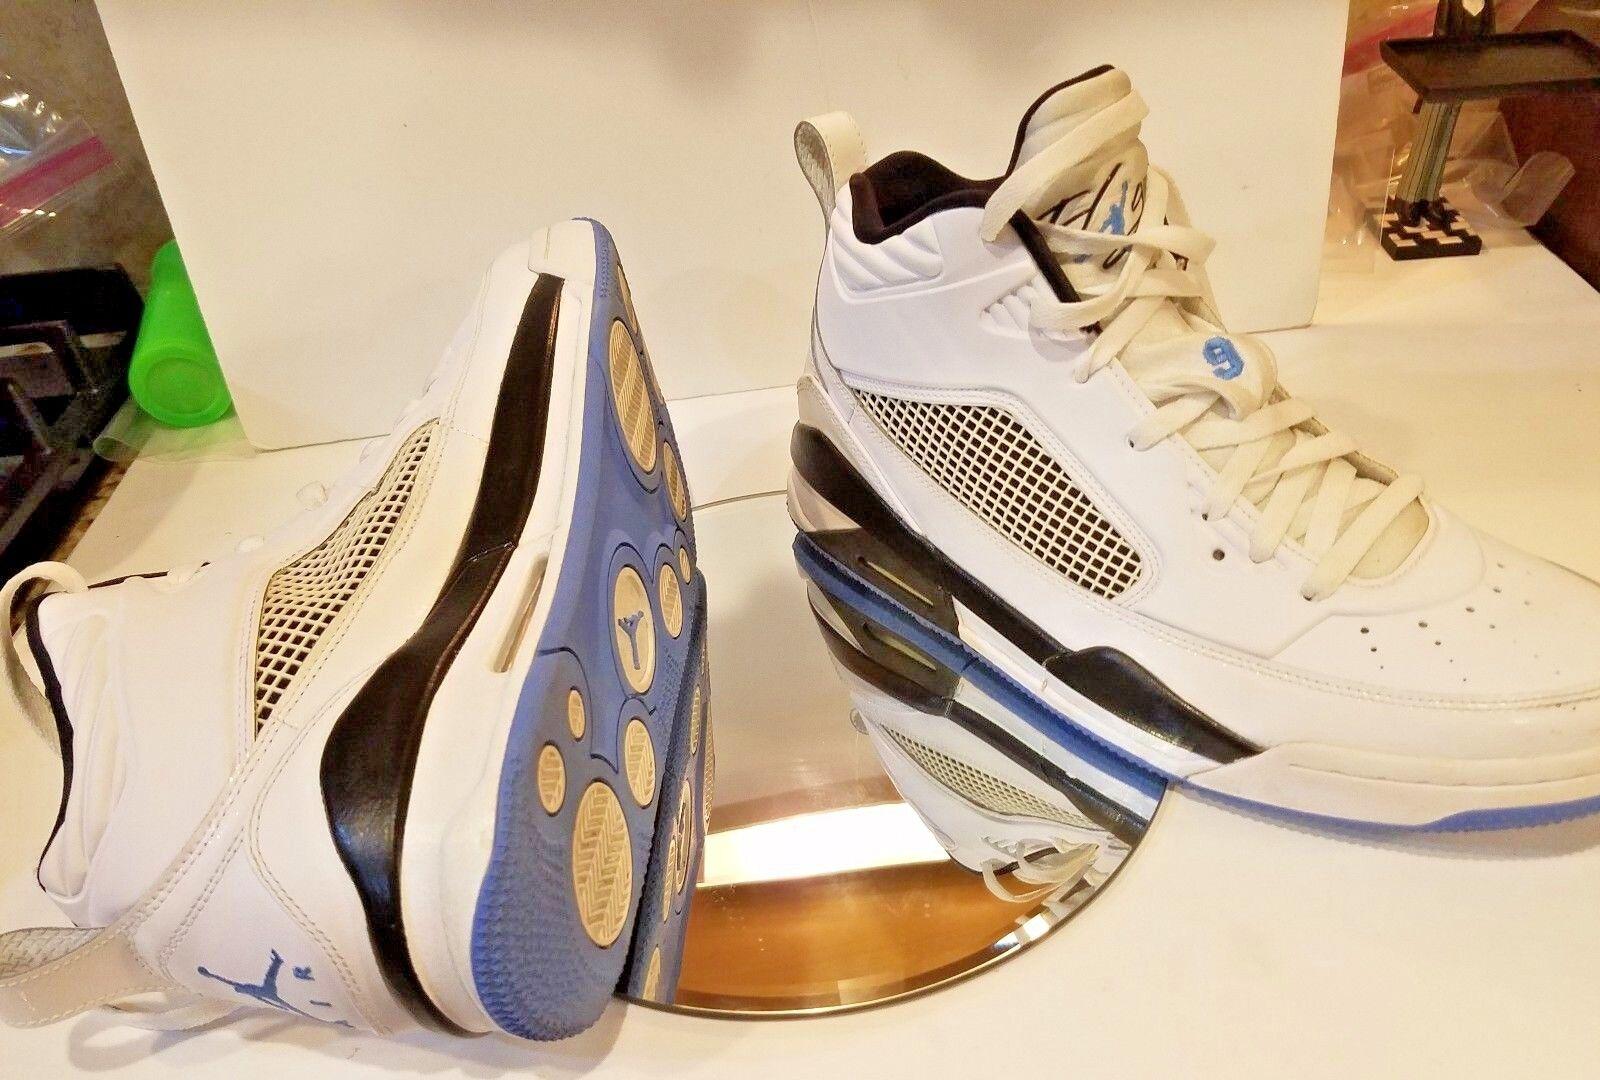 58accdd8fbc24 Nike Air Jordan Flight Flight Flight 9 High tops Navy Blue White Retro Men s  Size 12 a92629